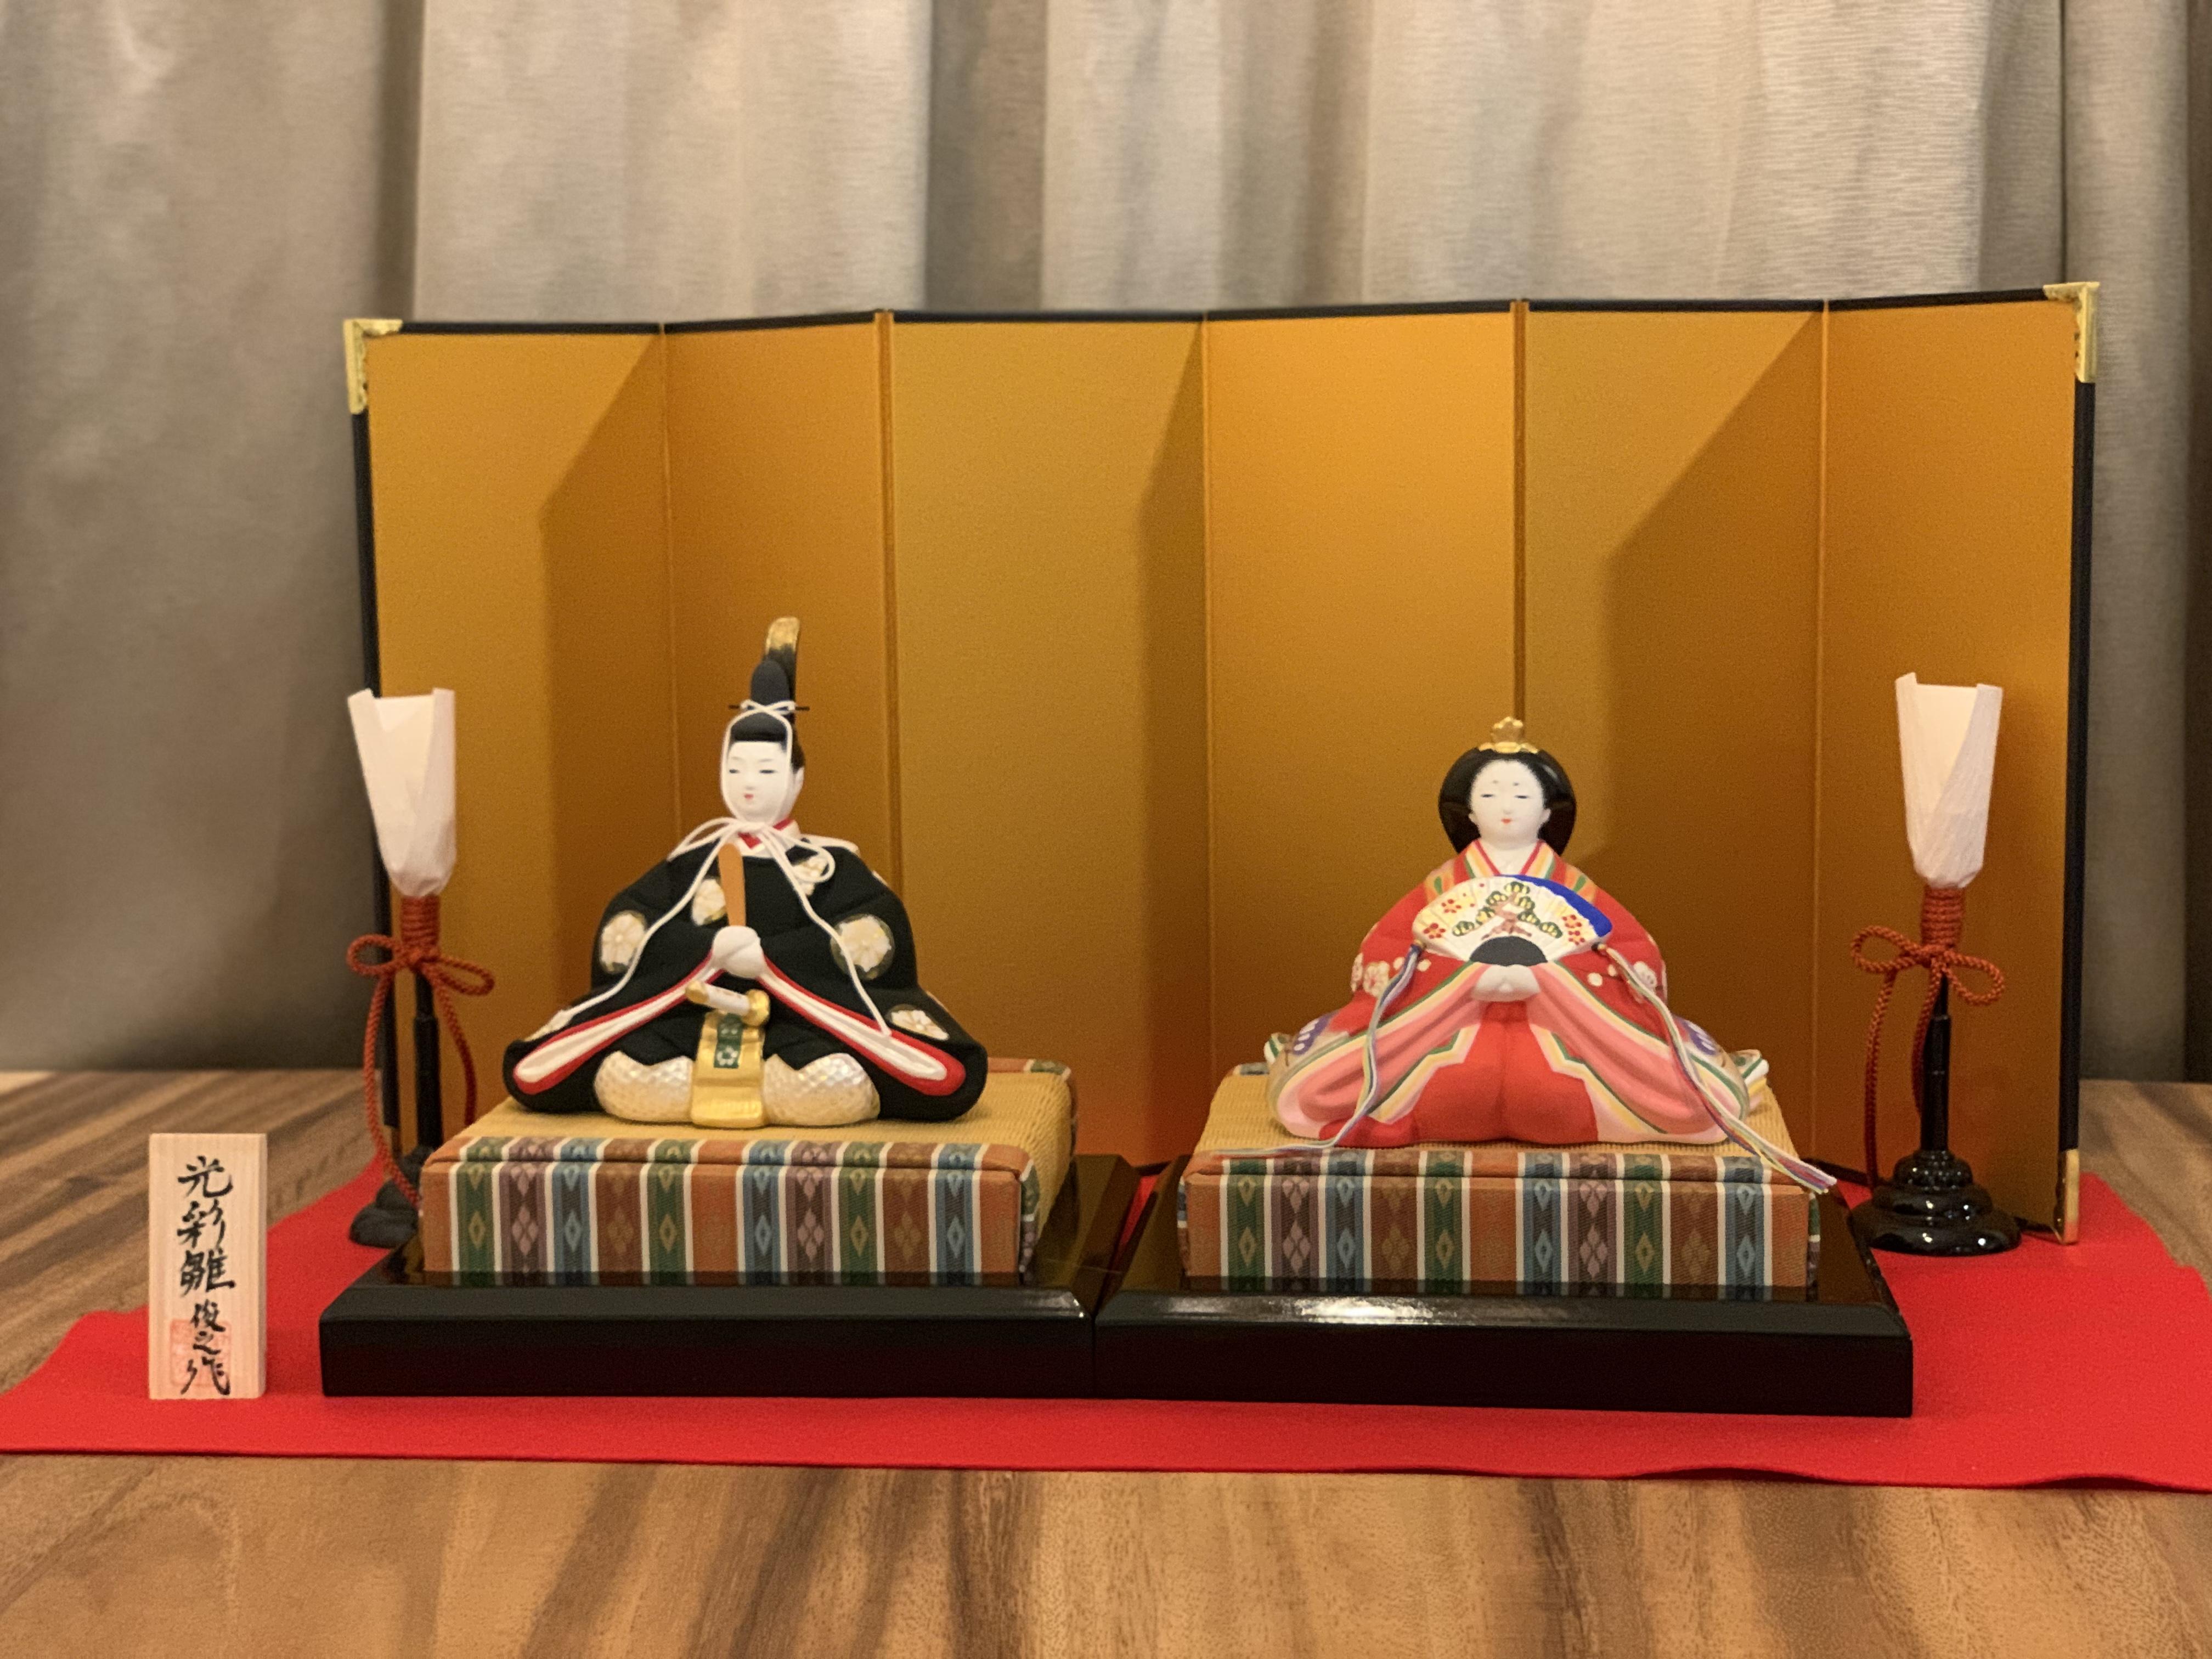 Japan celebrates Hina Matsuri on 3rd March